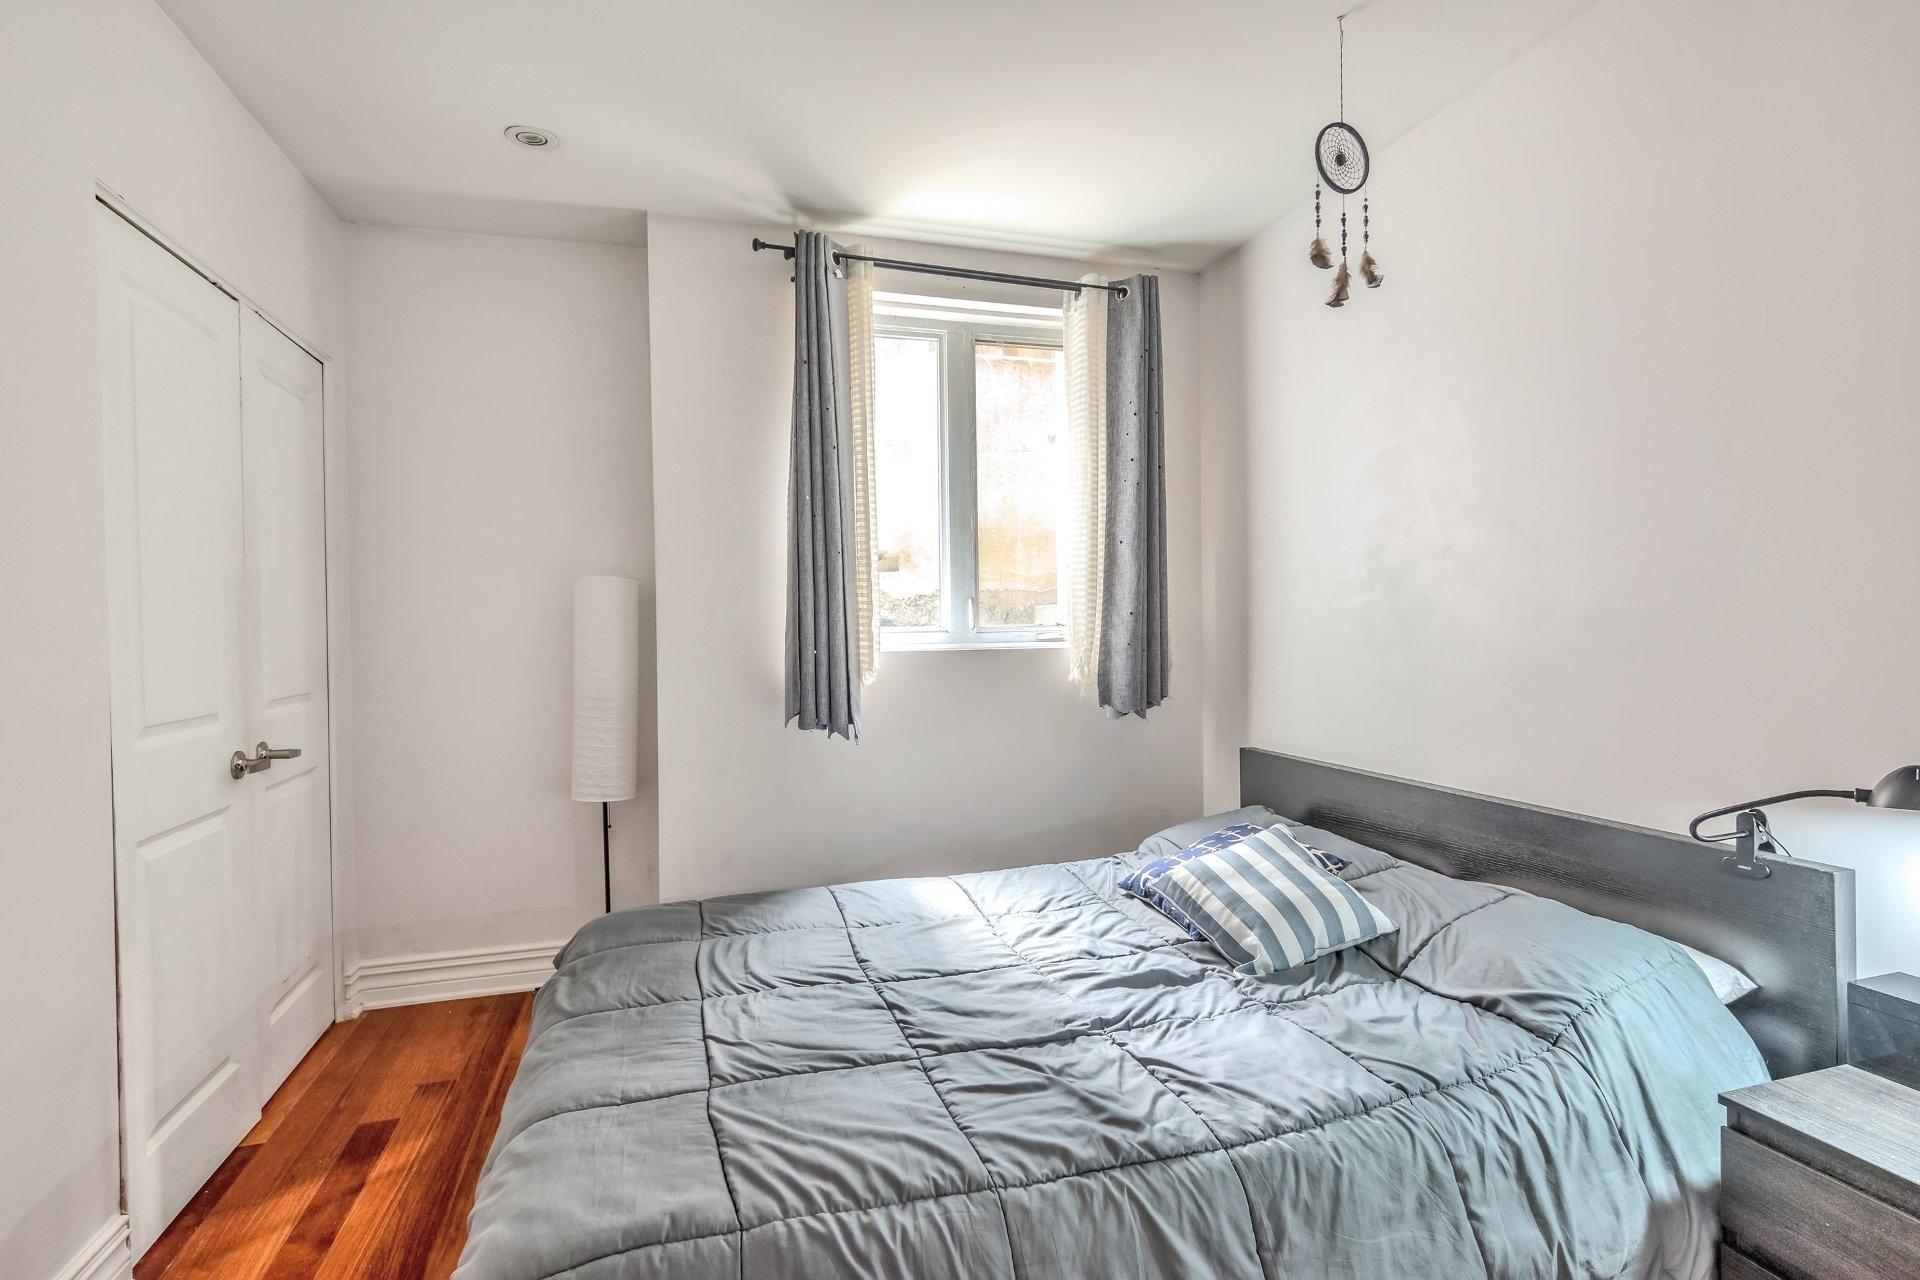 image 13 - Departamento En venta Le Plateau-Mont-Royal Montréal  - 3 habitaciones